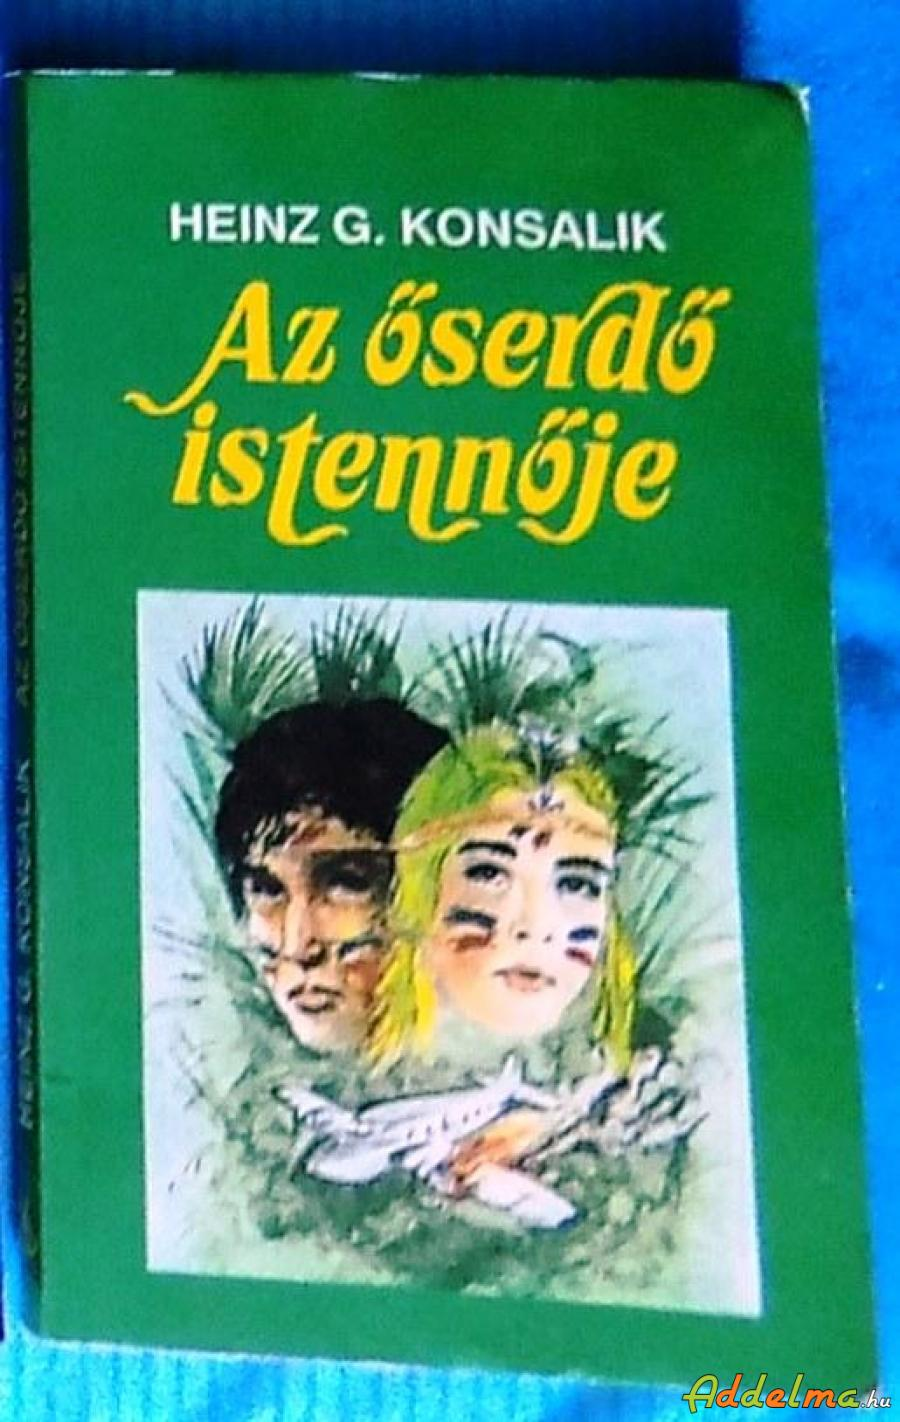 Heinz G. Konsalik: Az őserdő istennője